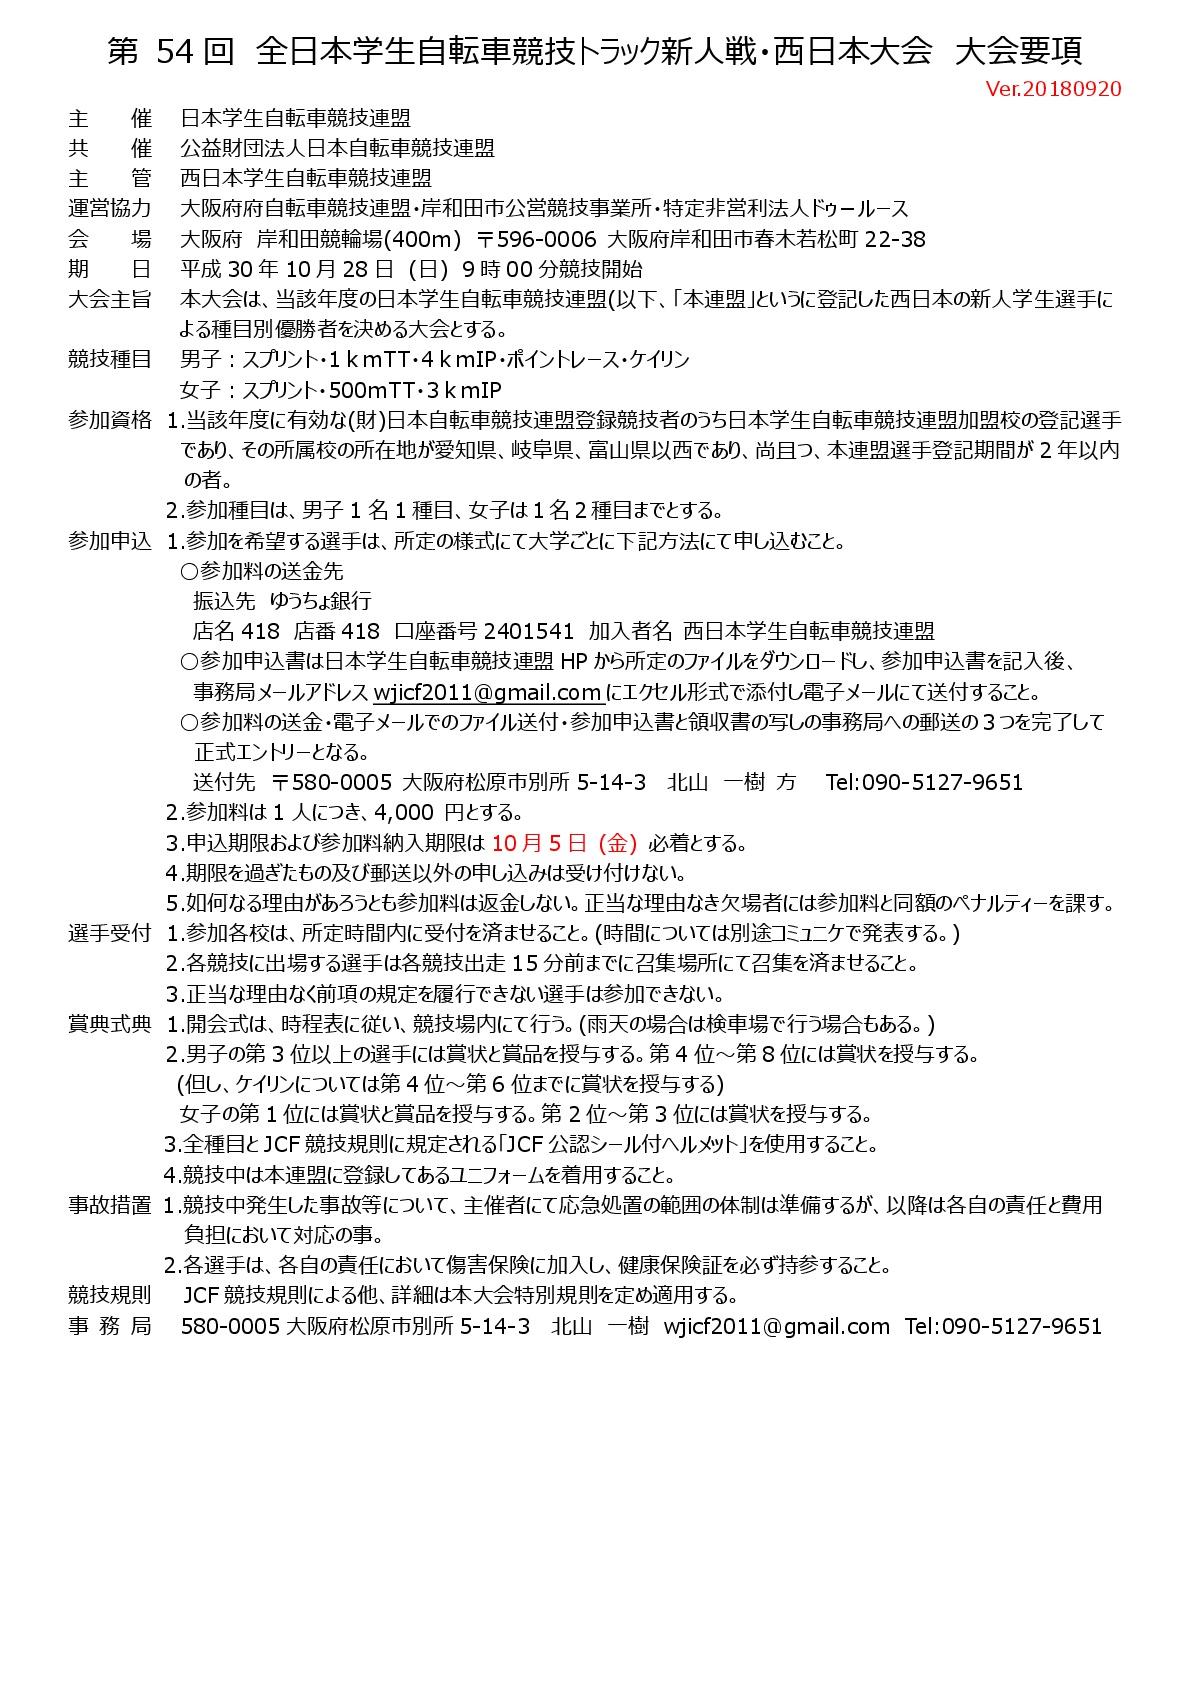 16west_tr_shinjin_yoko_160818_001